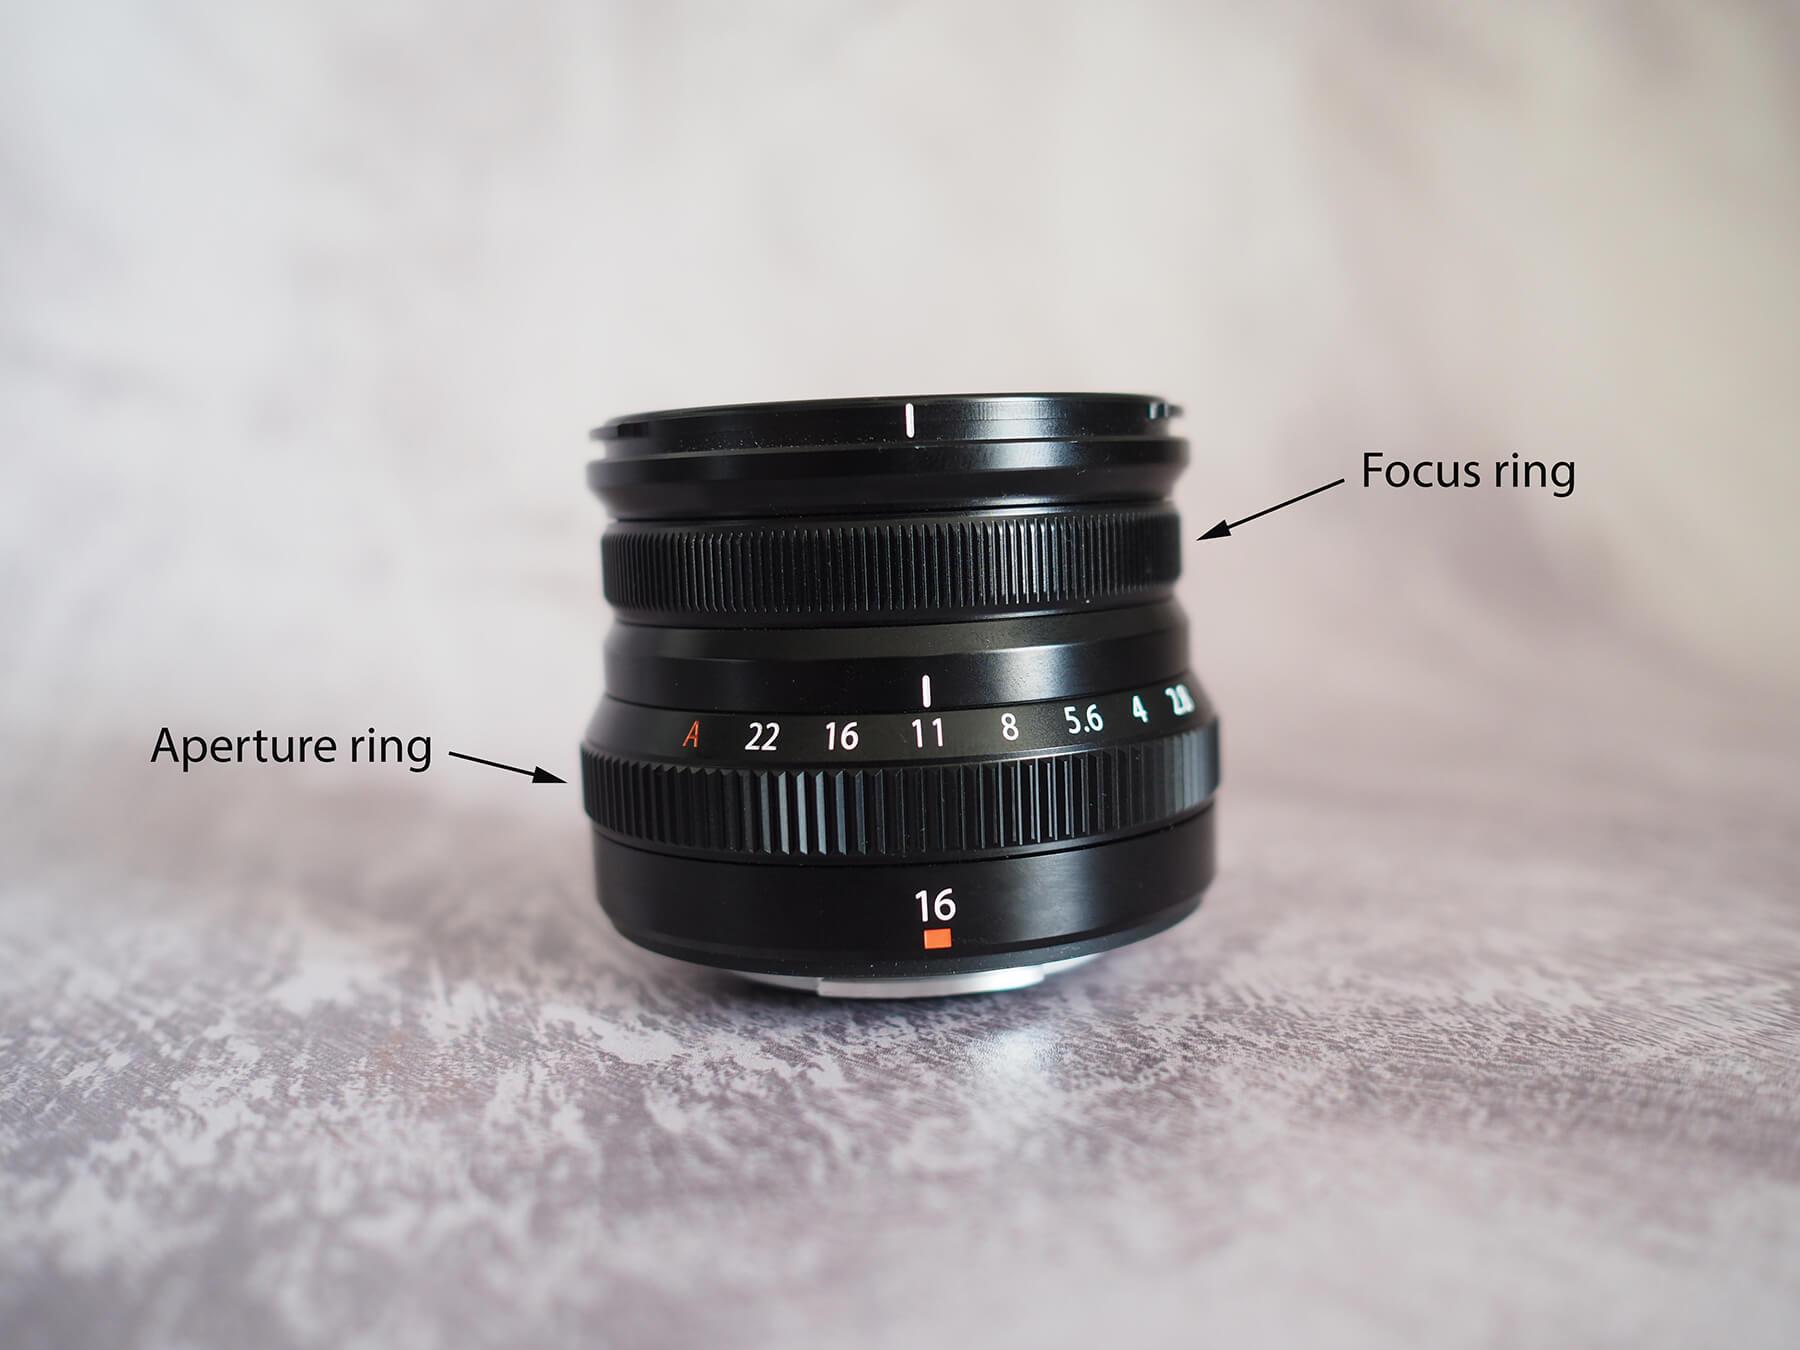 Lens aperture ring